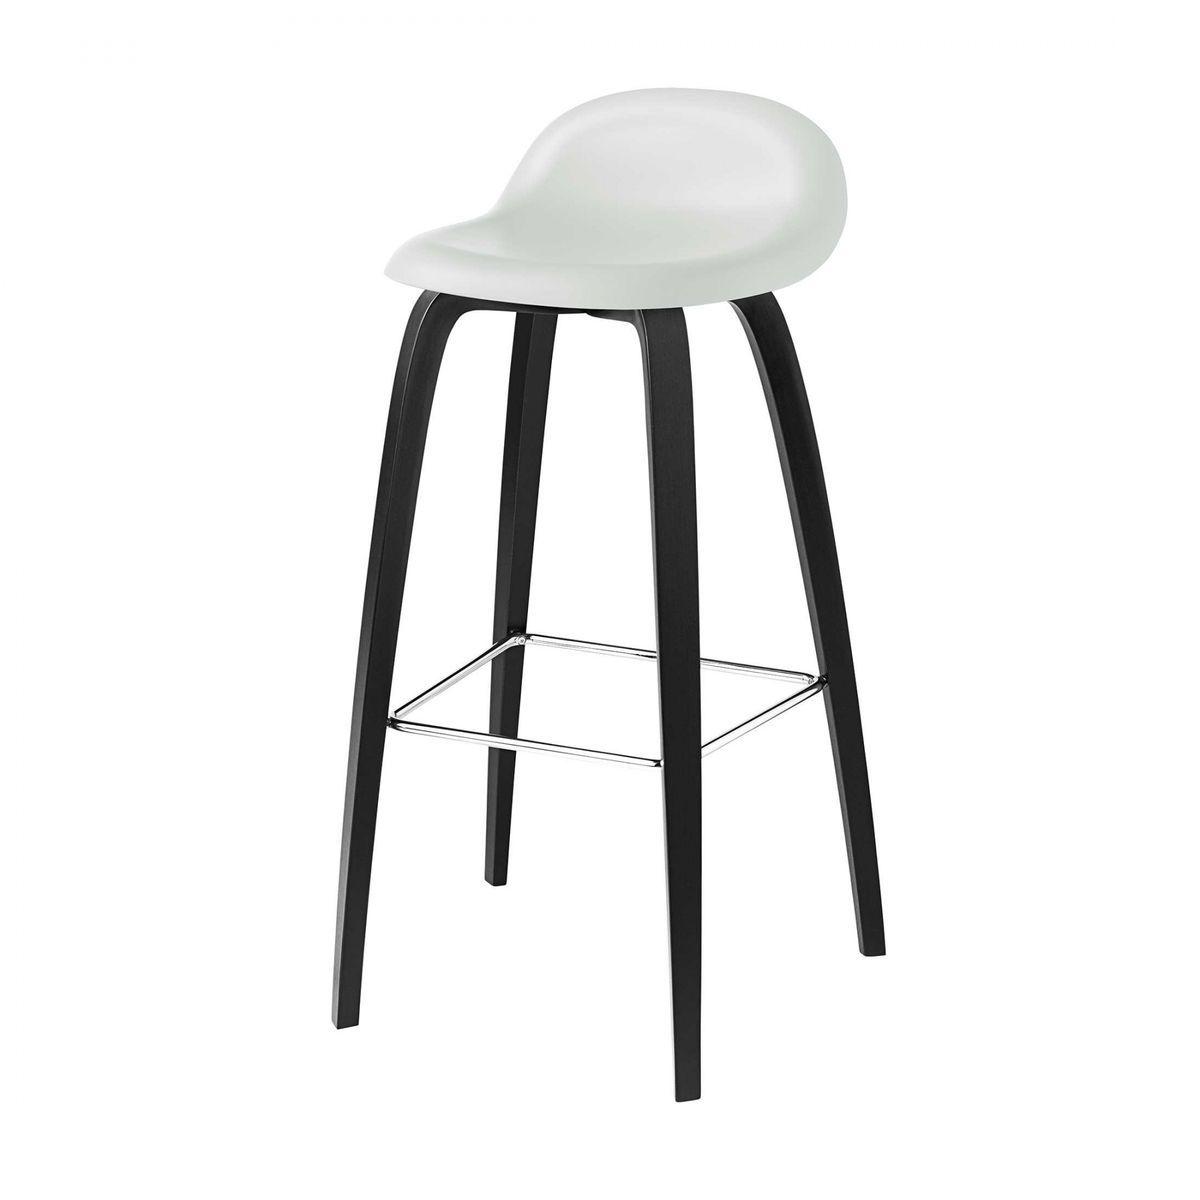 Gubi 3d bar stool barhocker mit buchengestell gubi for Schwarze barhocker